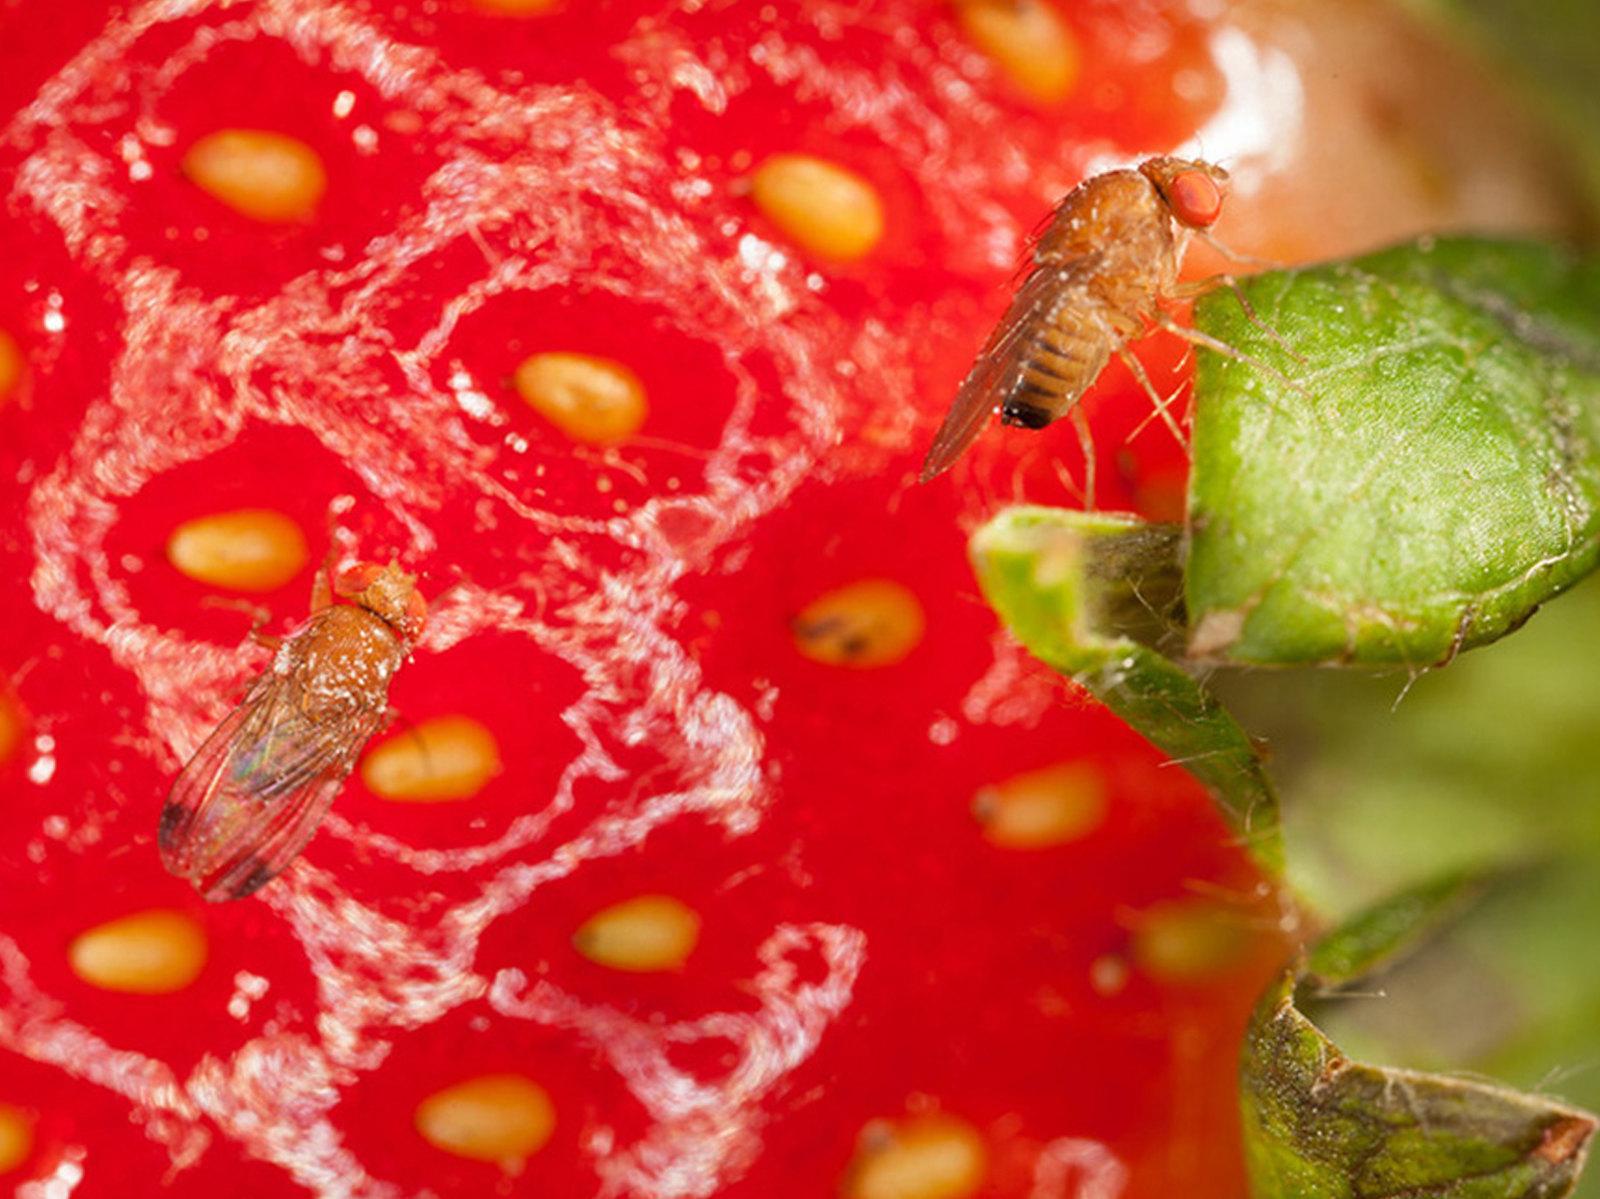 Drosophila suzukii | Agroscope (CC)